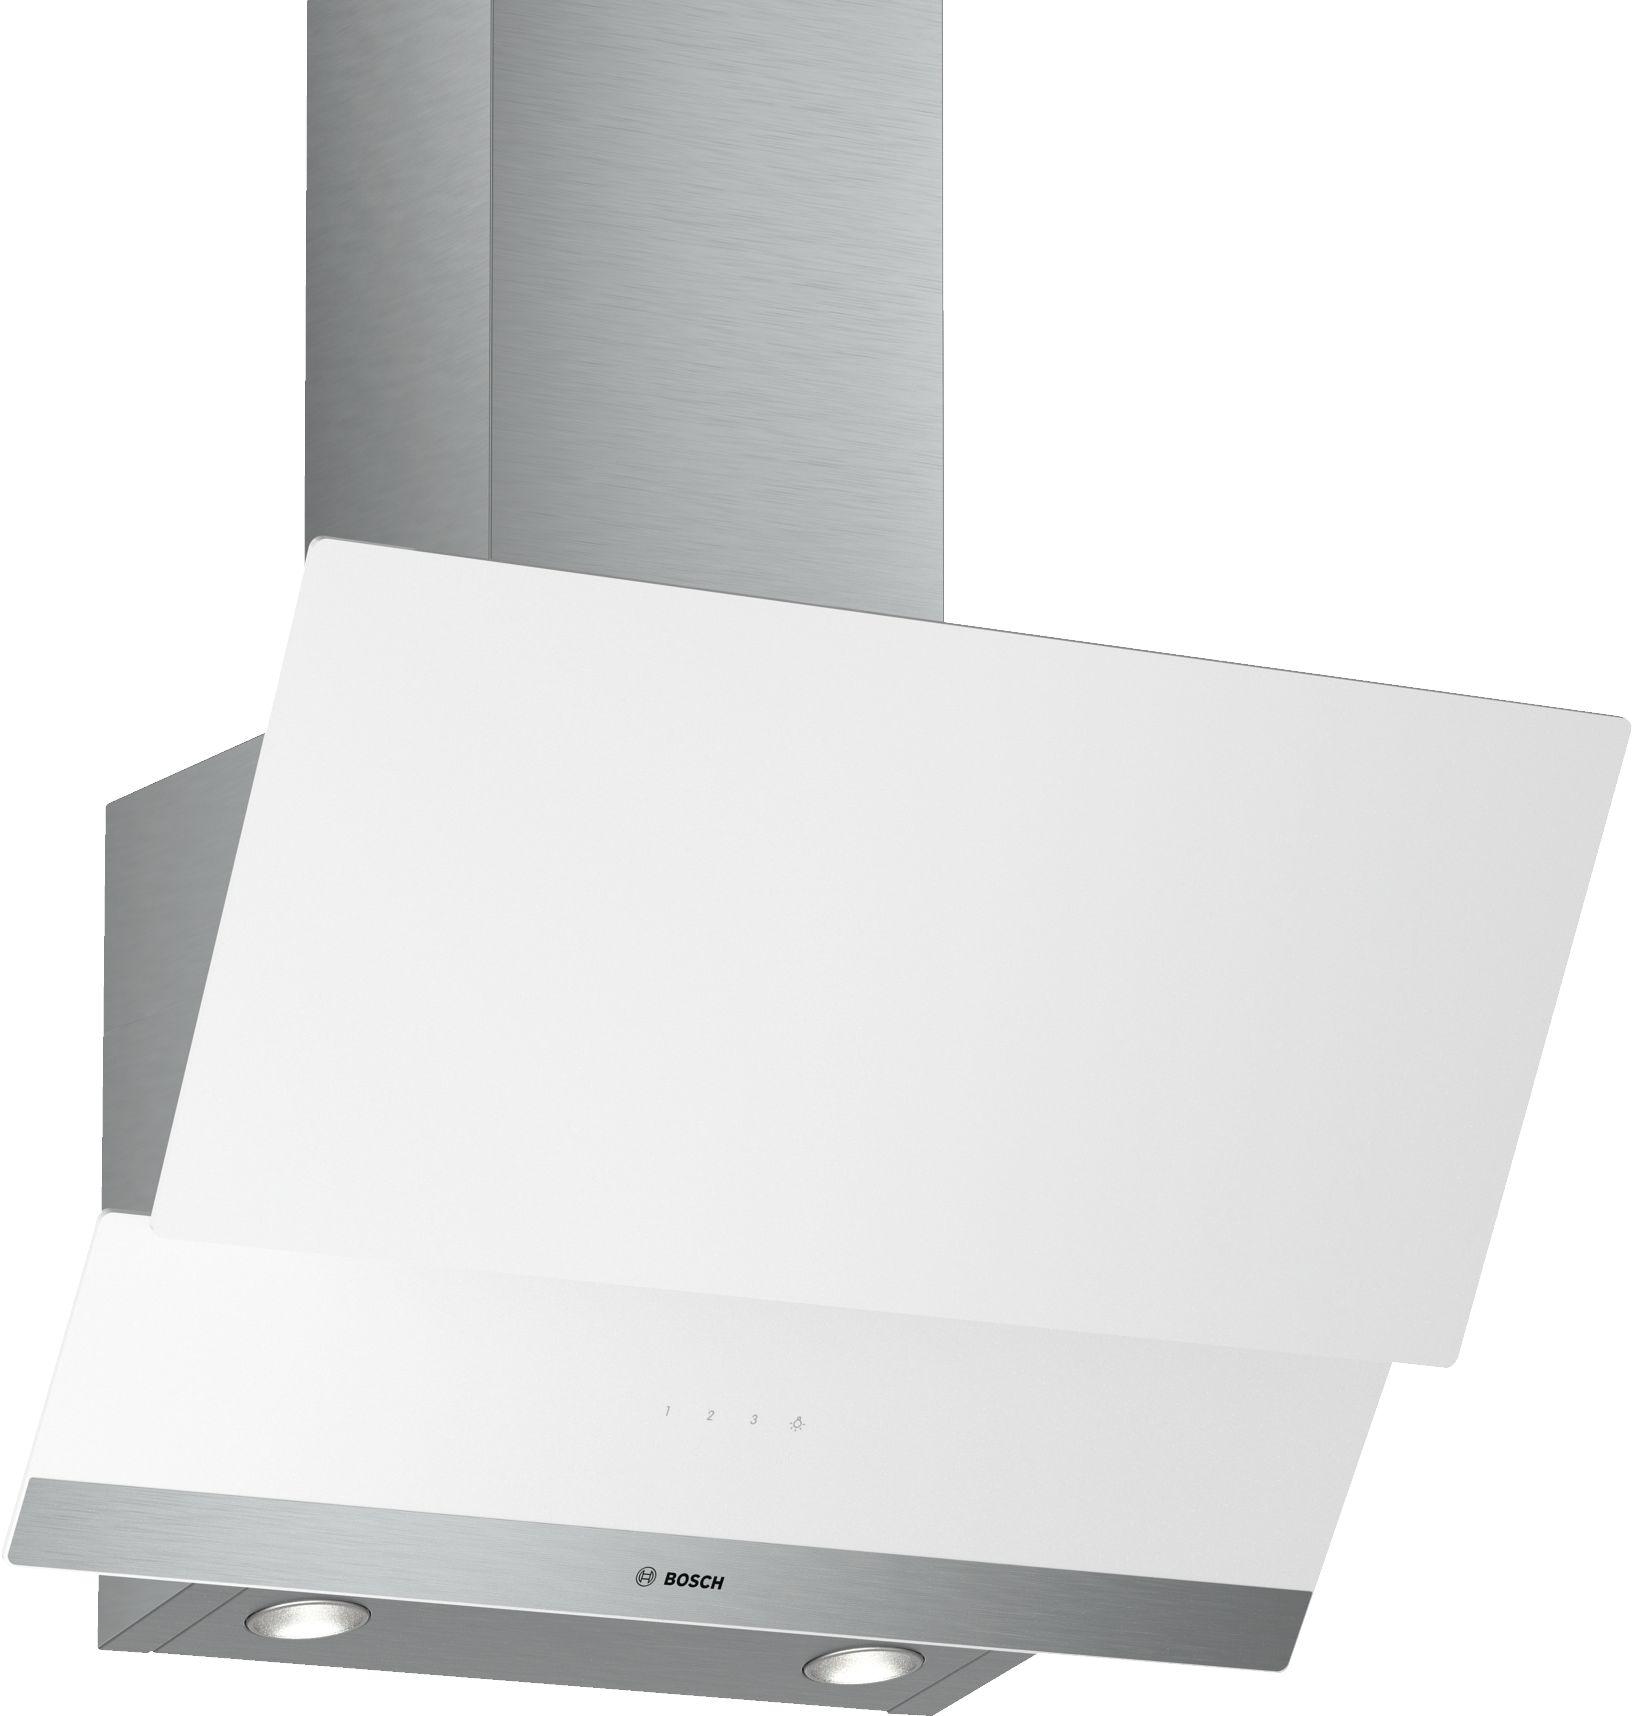 Bosch dwk065g20 major household appliances appliances for Bosch online shop